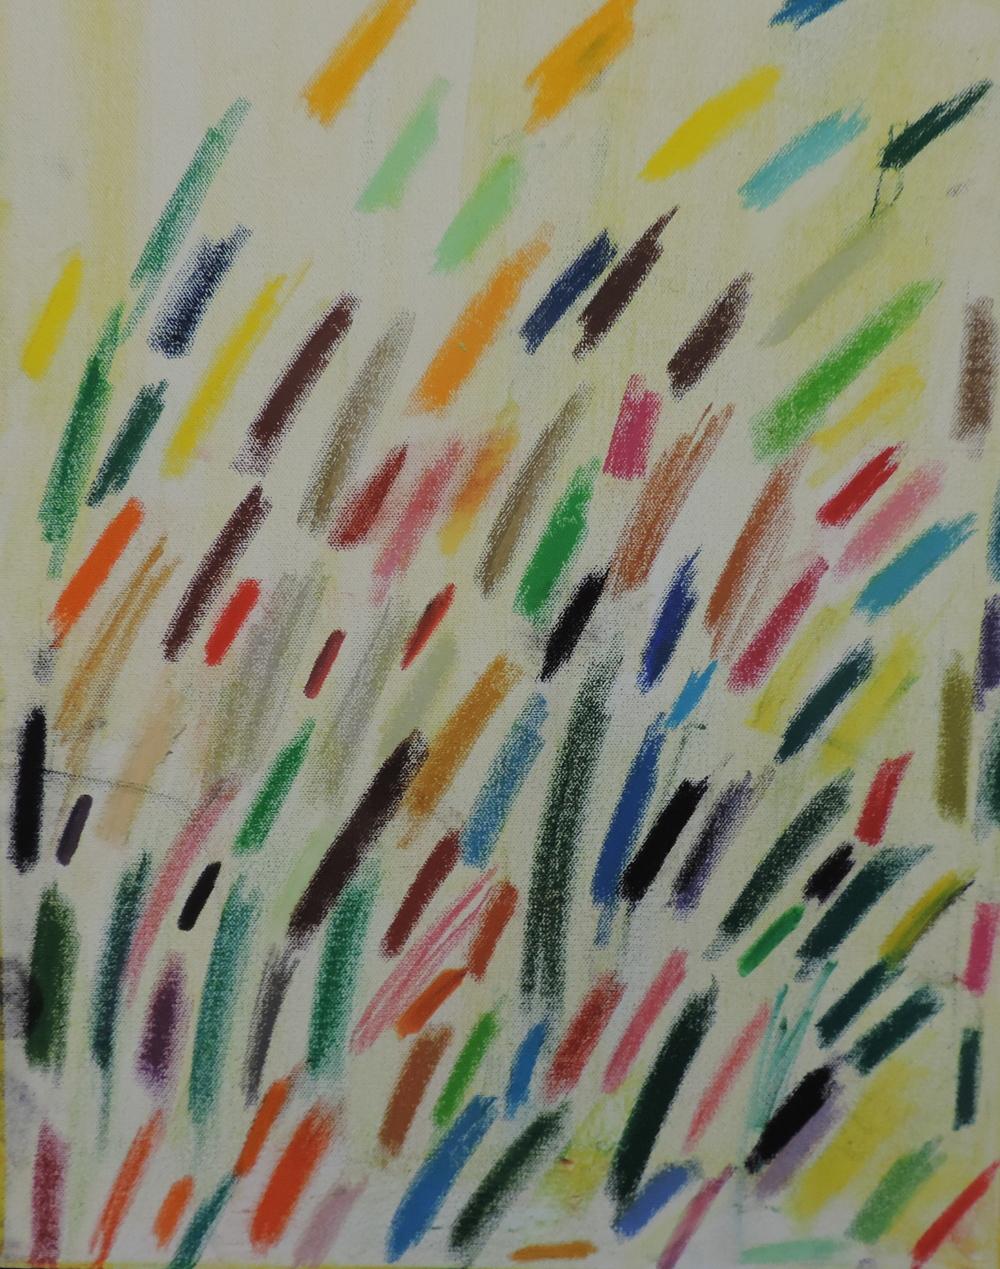 Coloured Light Bulbs, oil pastel on canvas, Trevor Fitzgerald, 2014